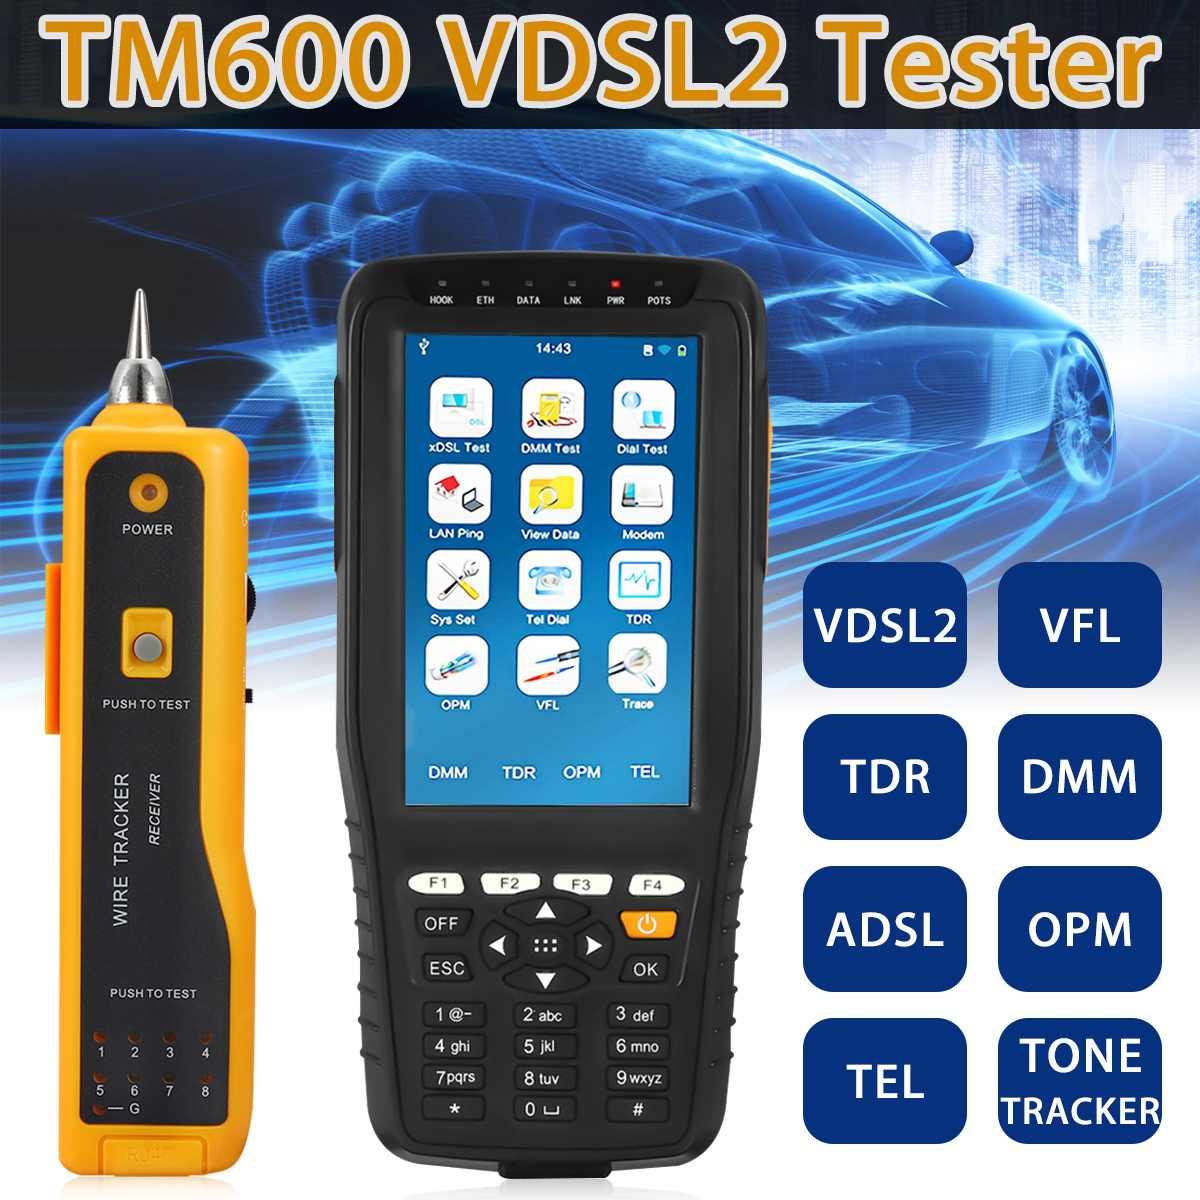 TM 600 VDSL VDSL2 Tester ADSL WAN LAN Tester xDSL Line Test Equipment with All Functions DSL Physical Layer Test